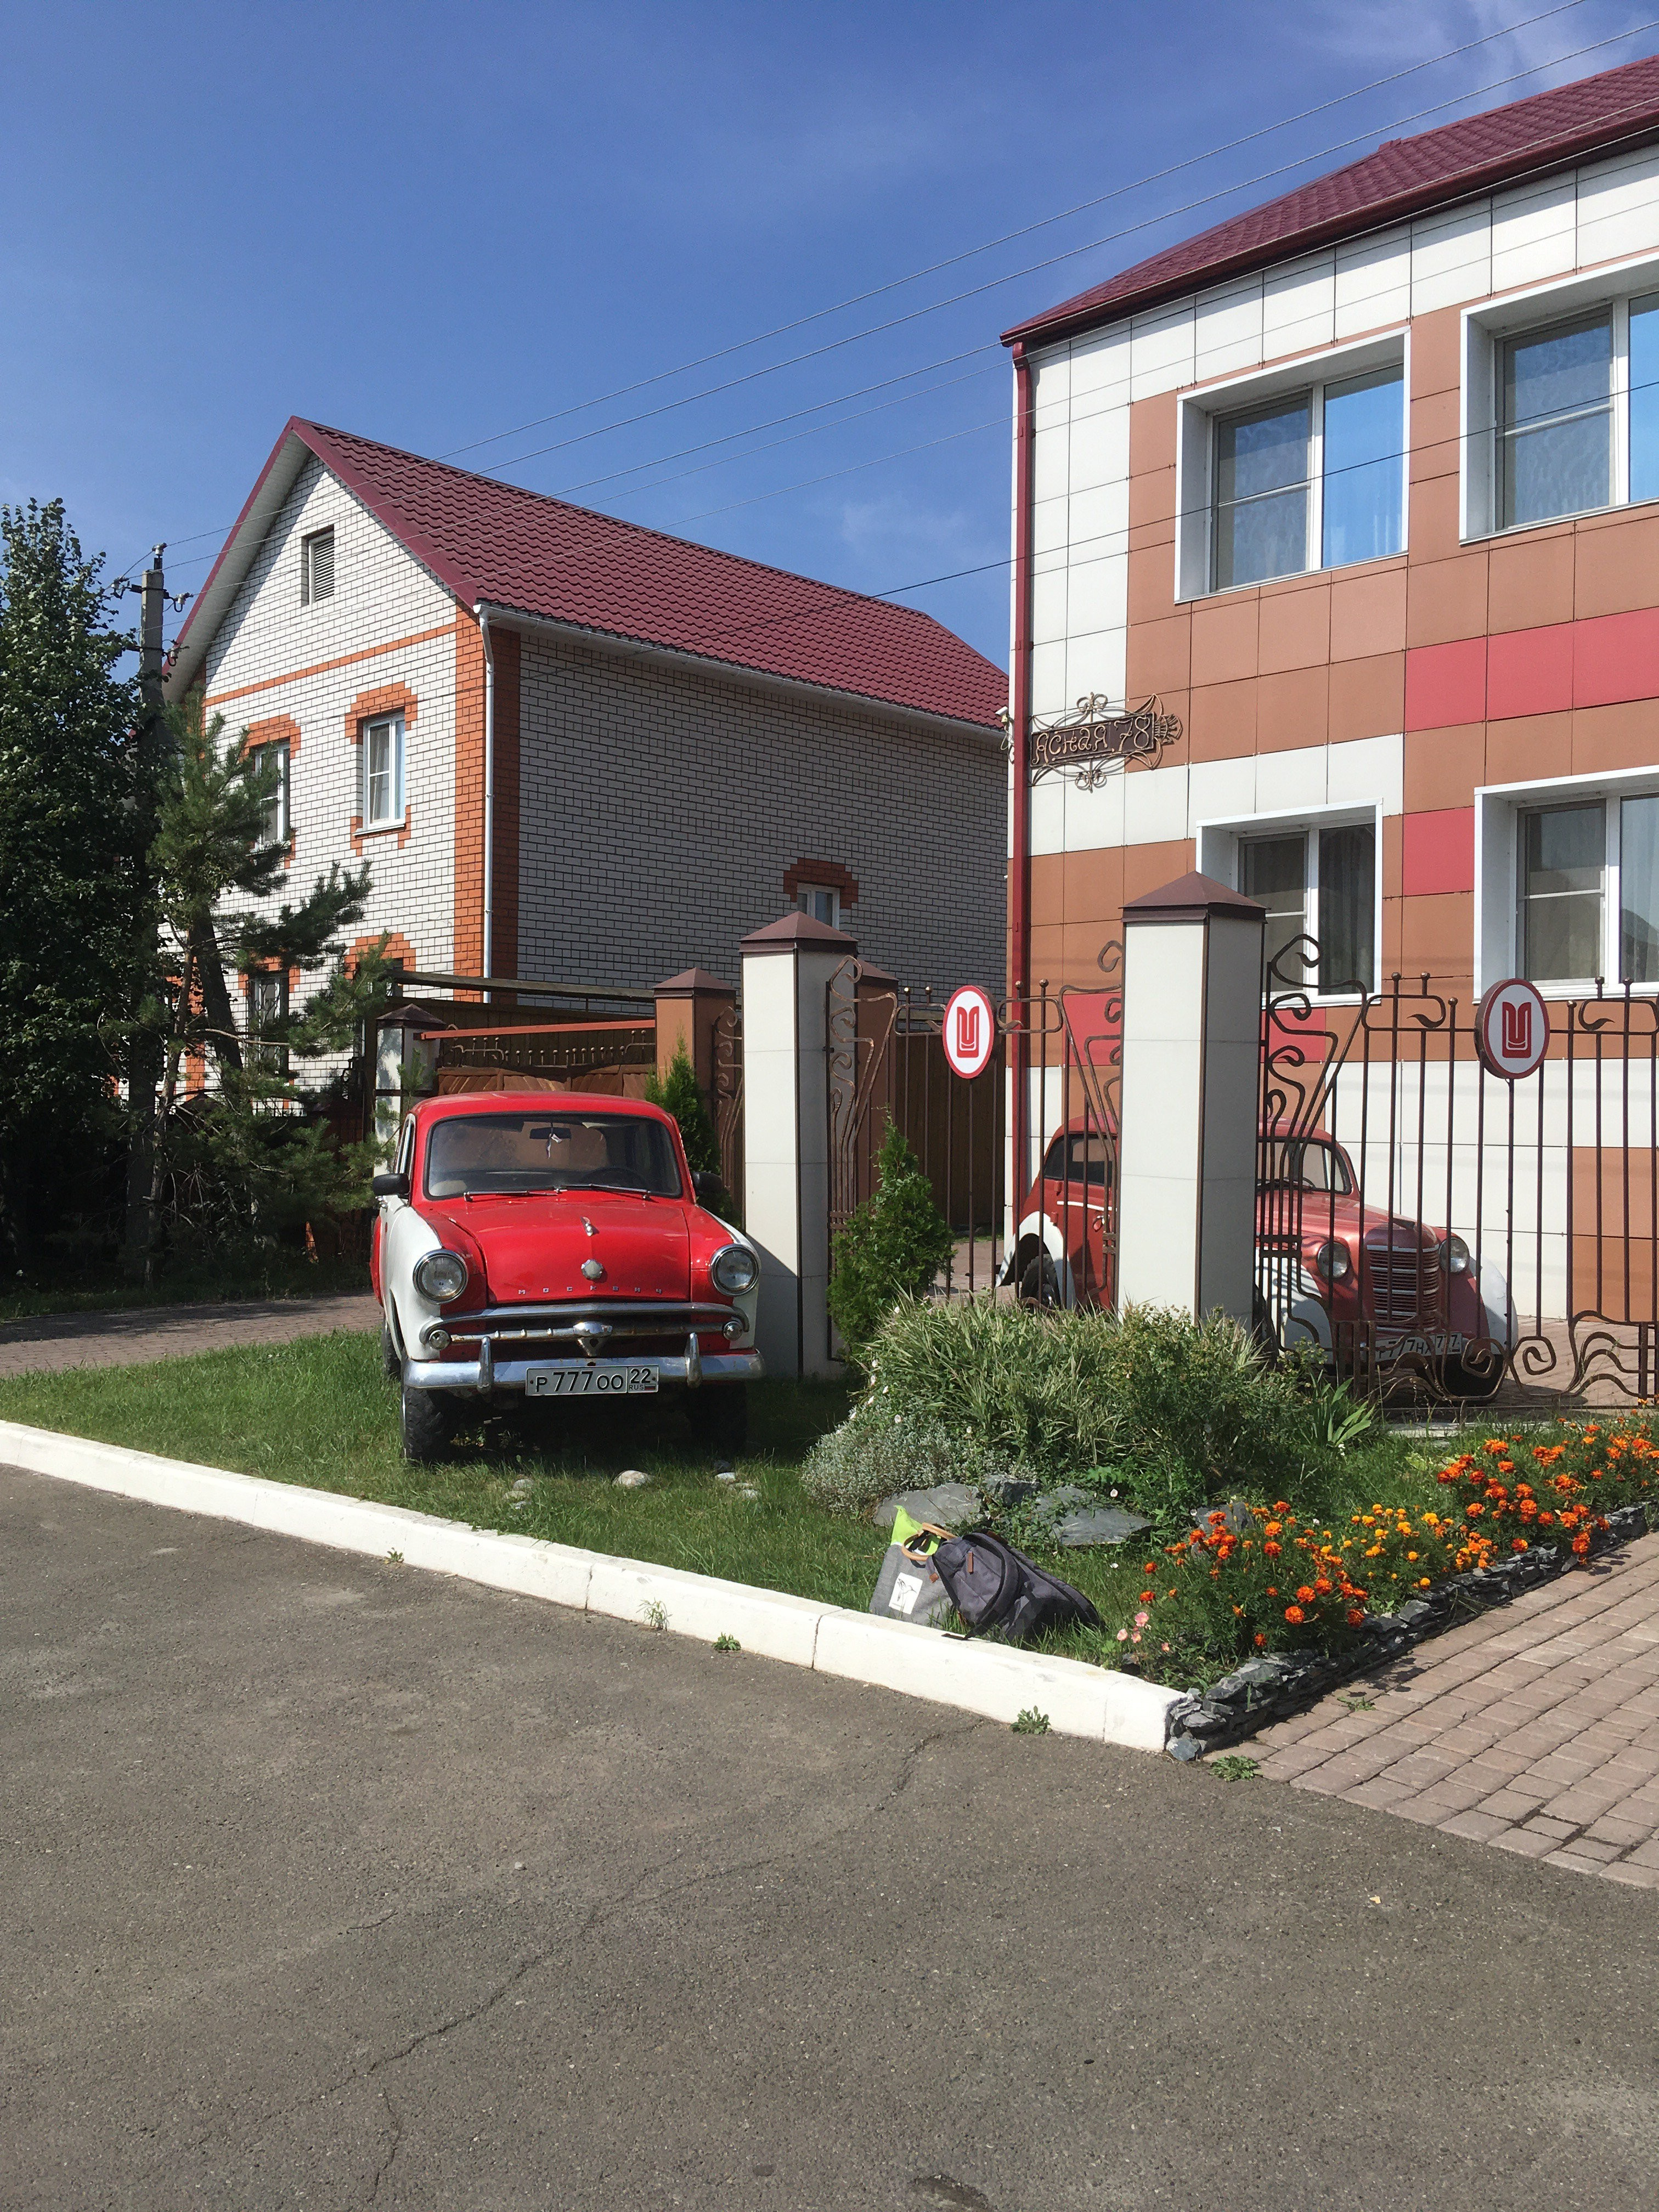 Москвич, гостевой дом - №1